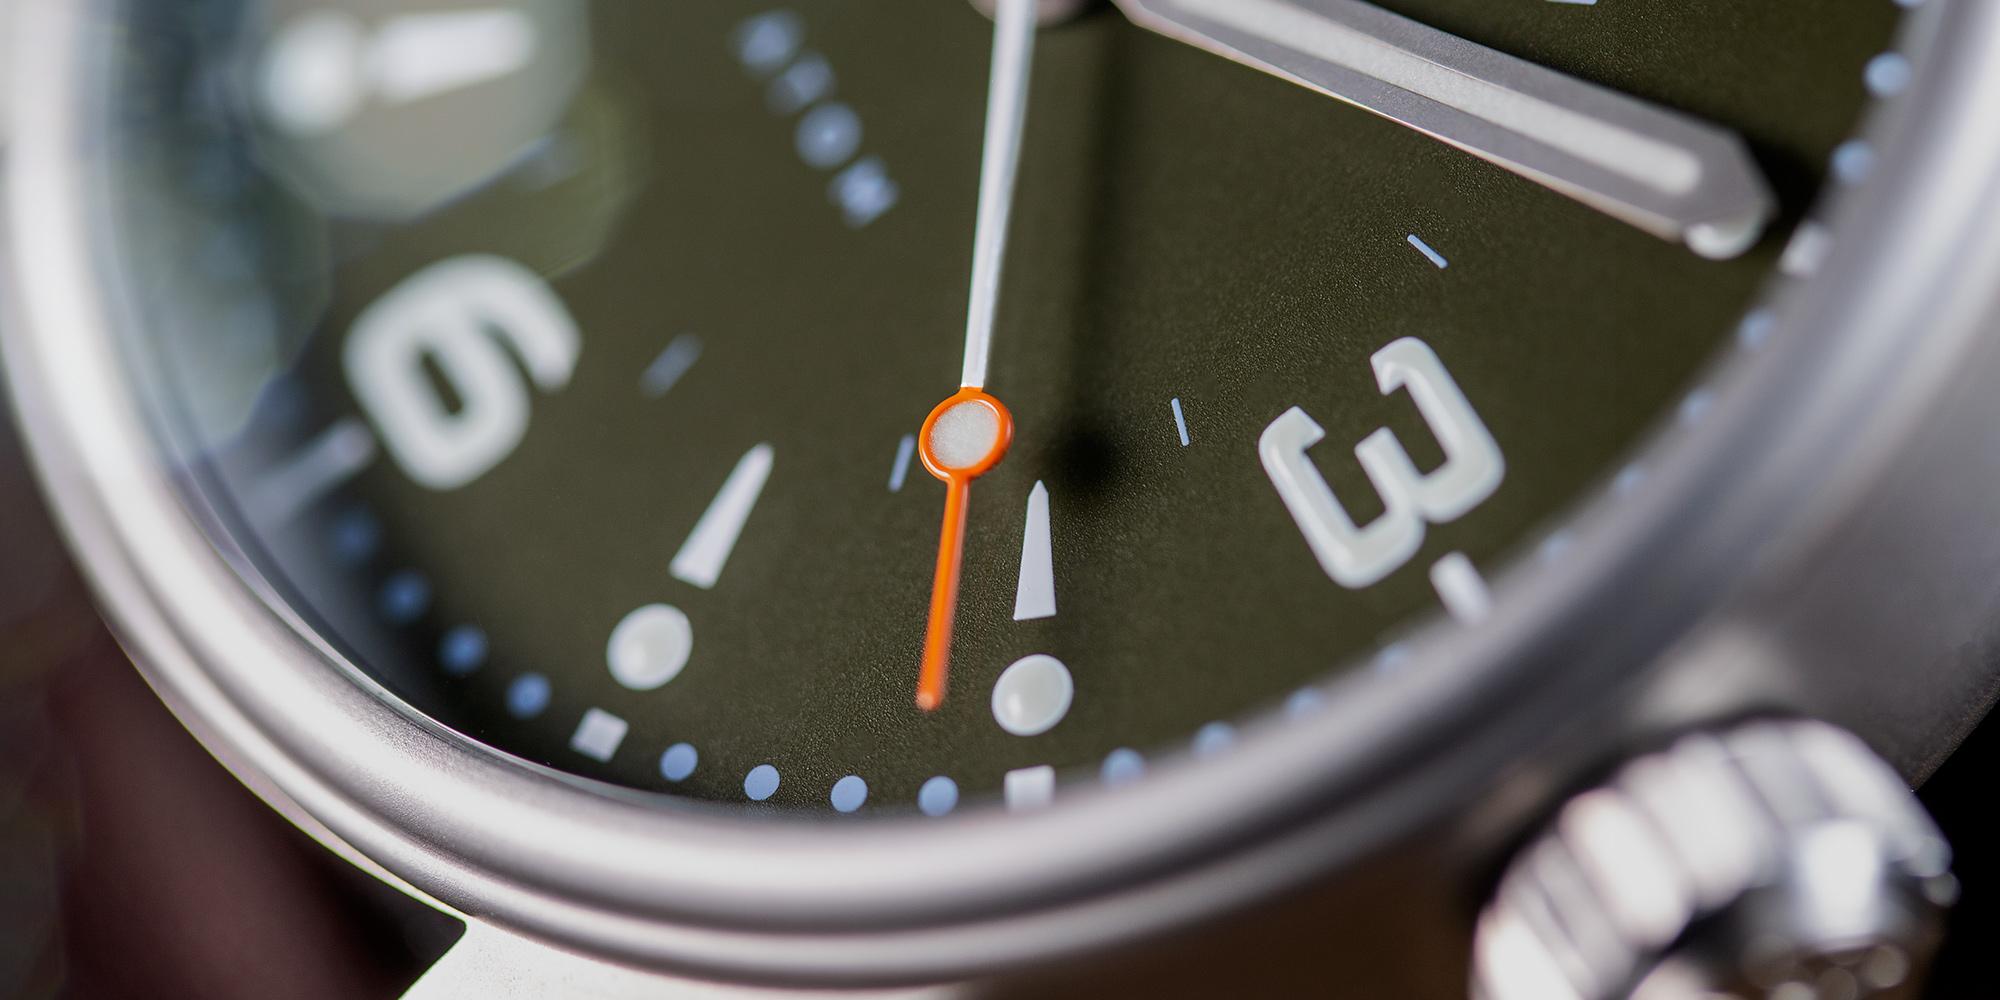 Pinion-Atom-39-no-date-watch-hunter-green-007